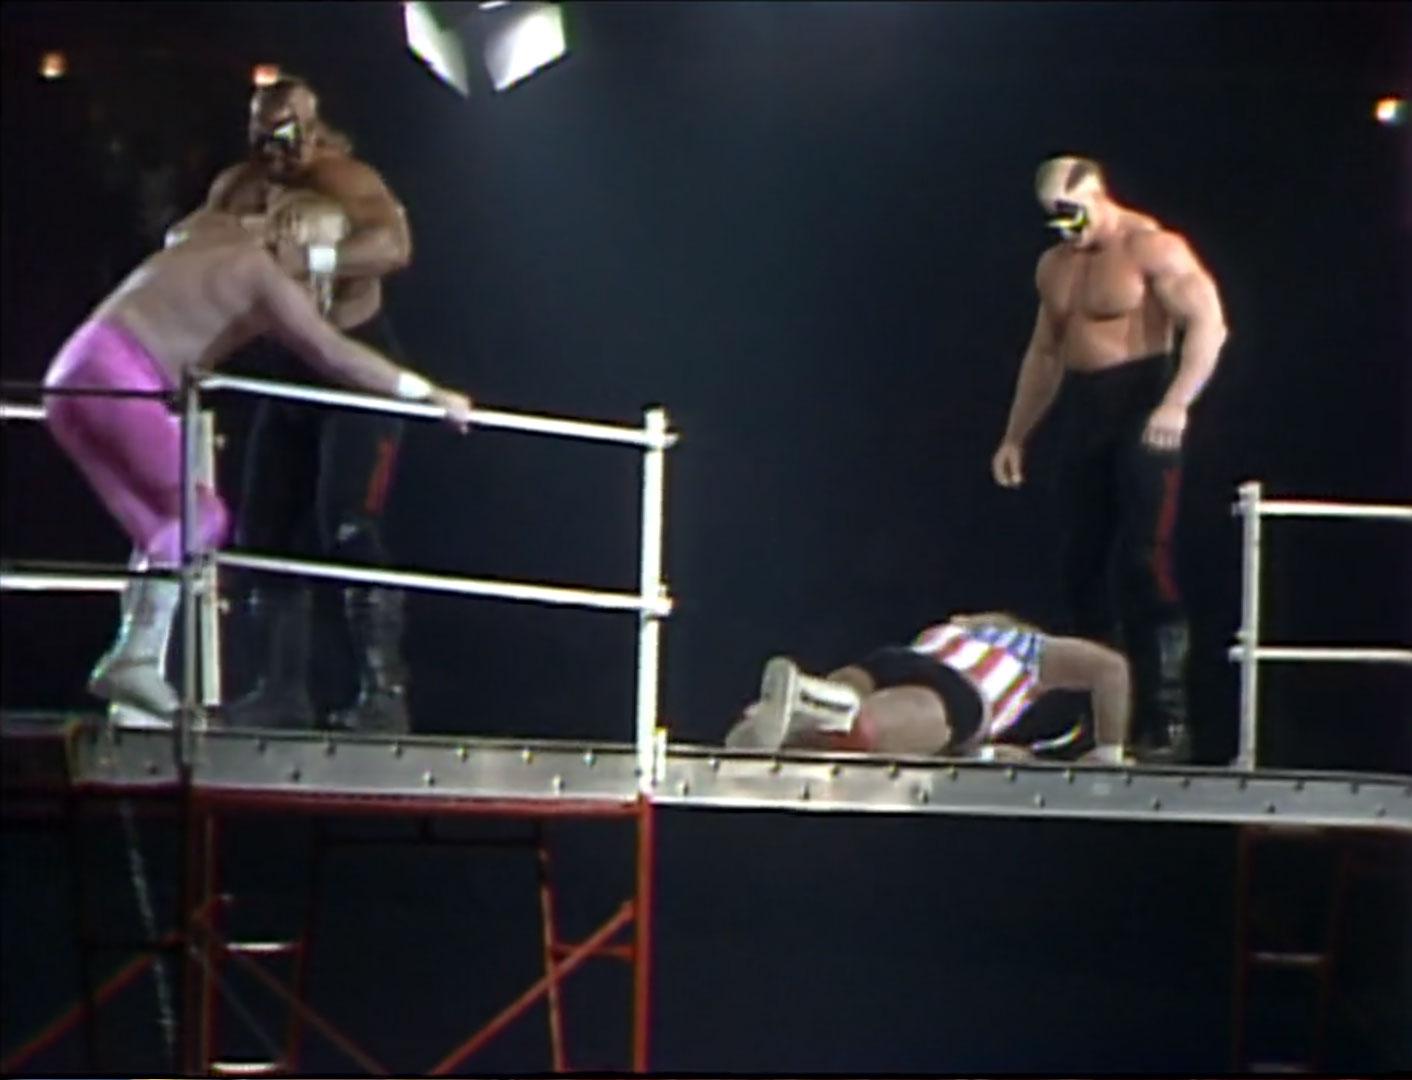 The Road Warriors vs. Midnight Express Scaffold Match, Starrcade '86, Nov 27th 1986